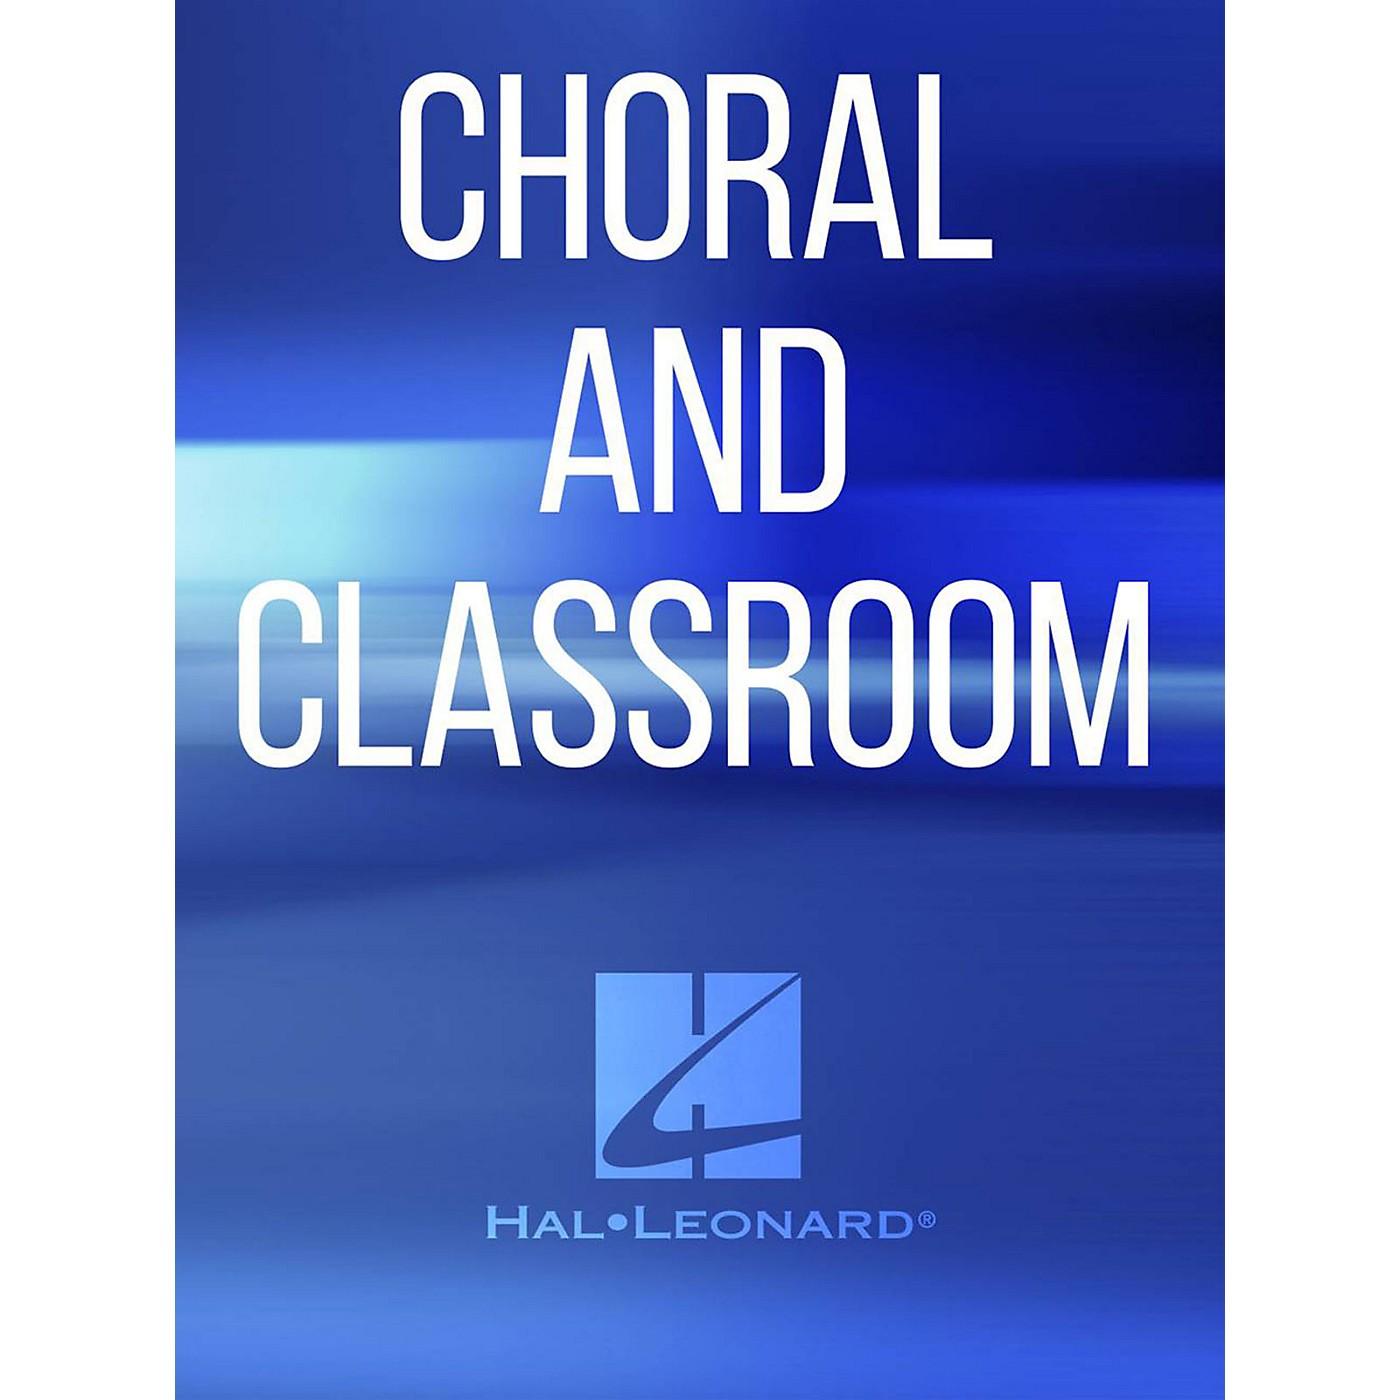 Hal Leonard Agnus Dei SATB Composed by Walter Ehret Enterprises thumbnail